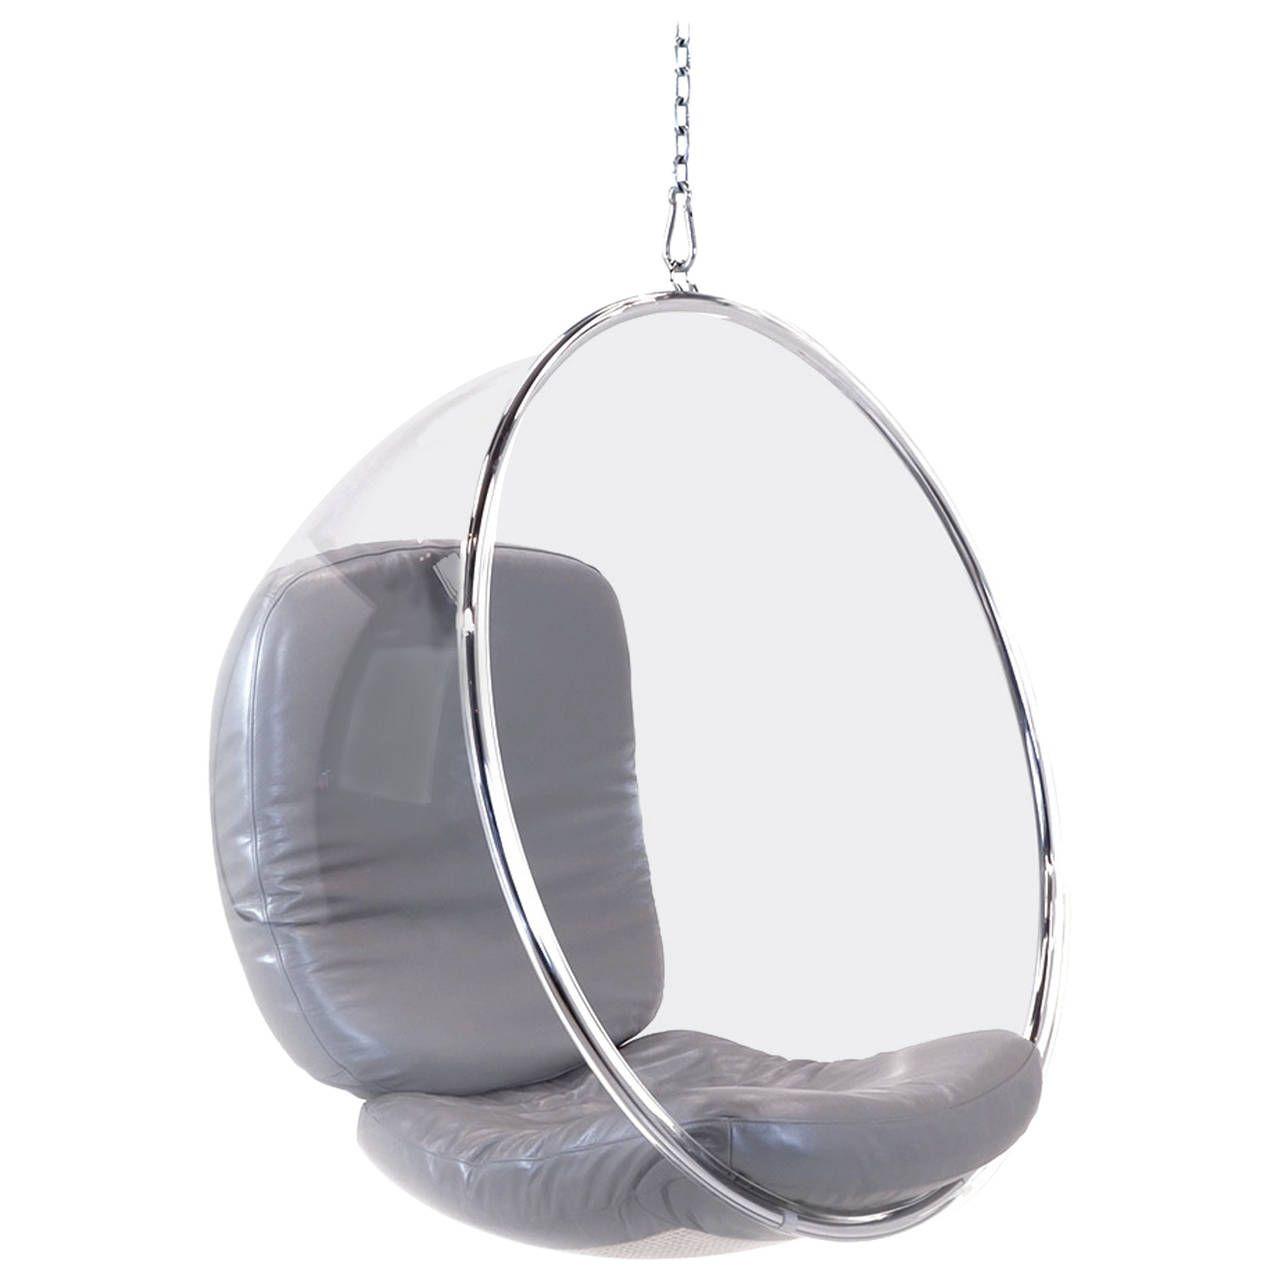 Original Eero Aarnio Bubble Chair, Adelta, Finland | Bubble chair ...